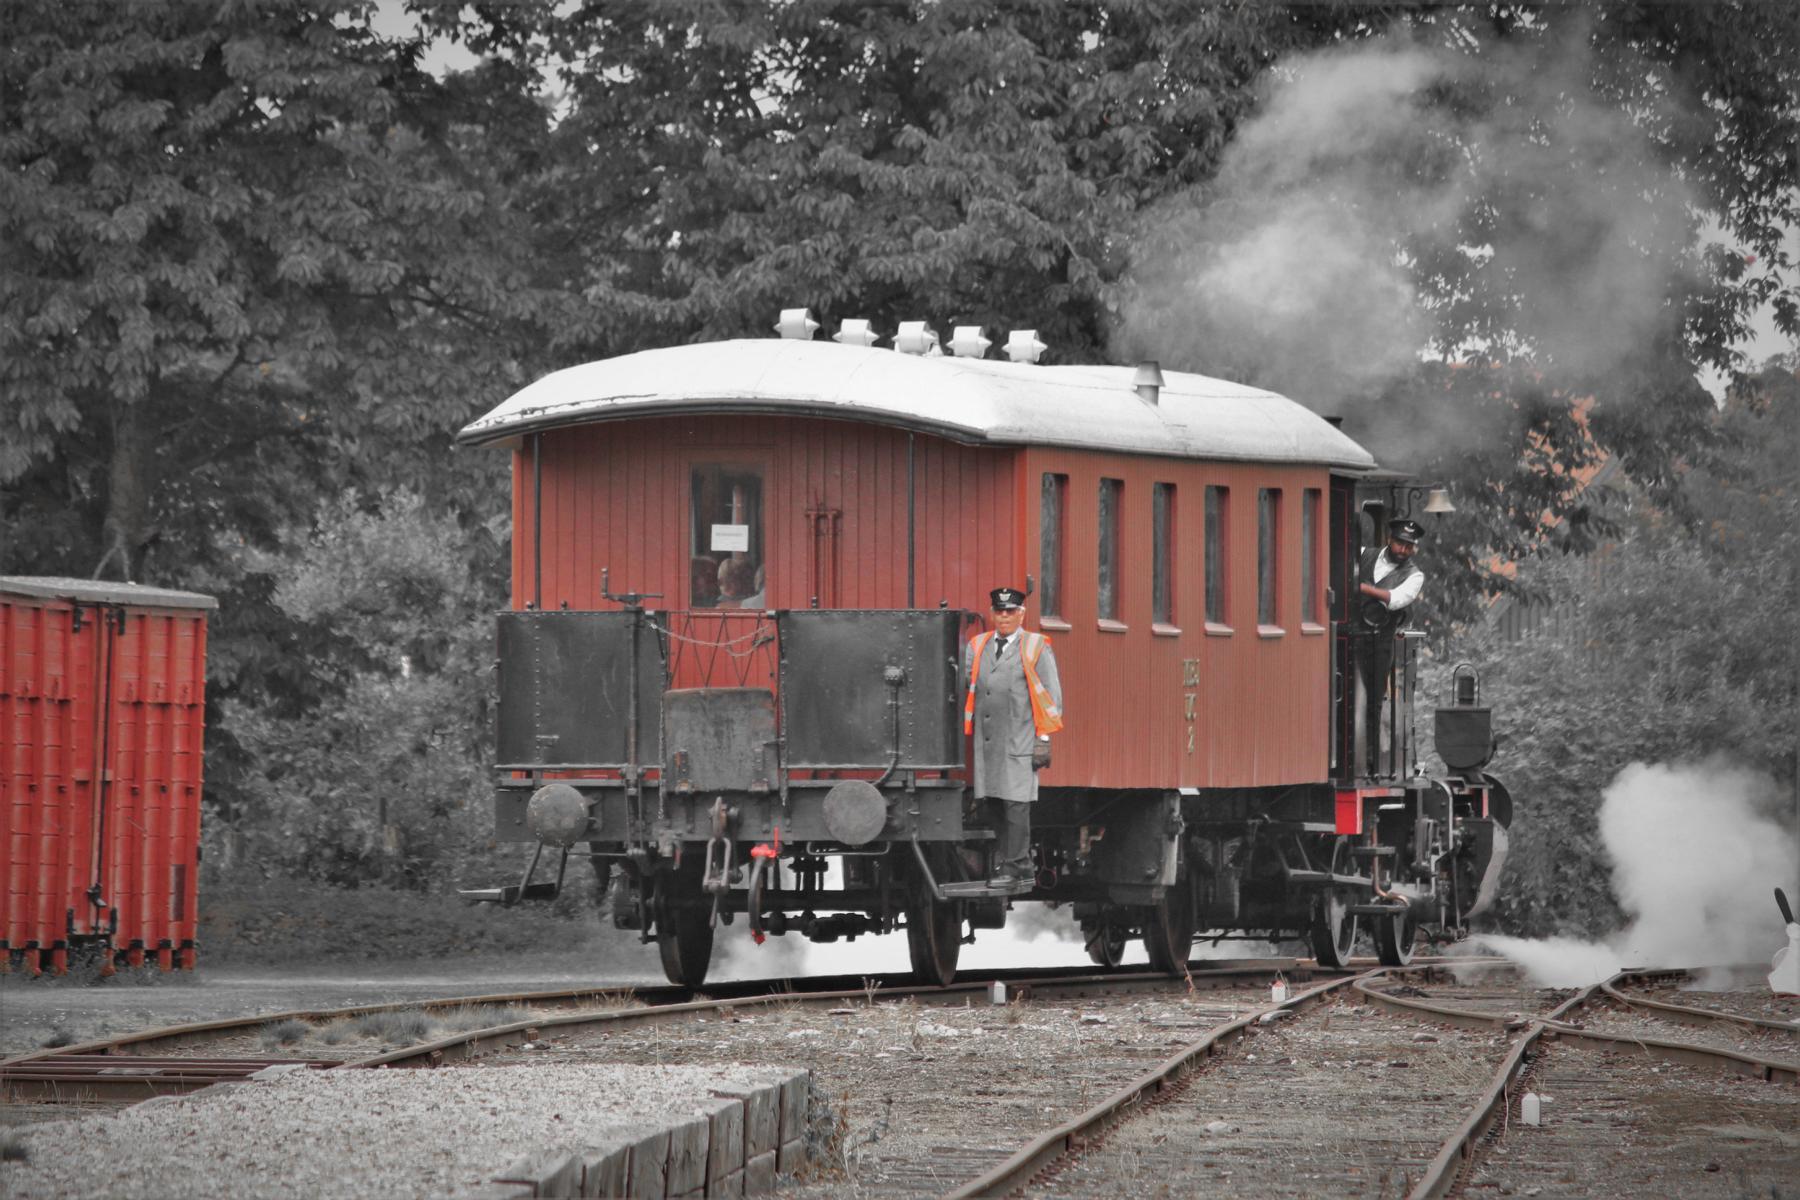 OKTOBER-MOTIV | ©Foto: Christian Wodzinski | Museumsbahn Maribo-Bandholm